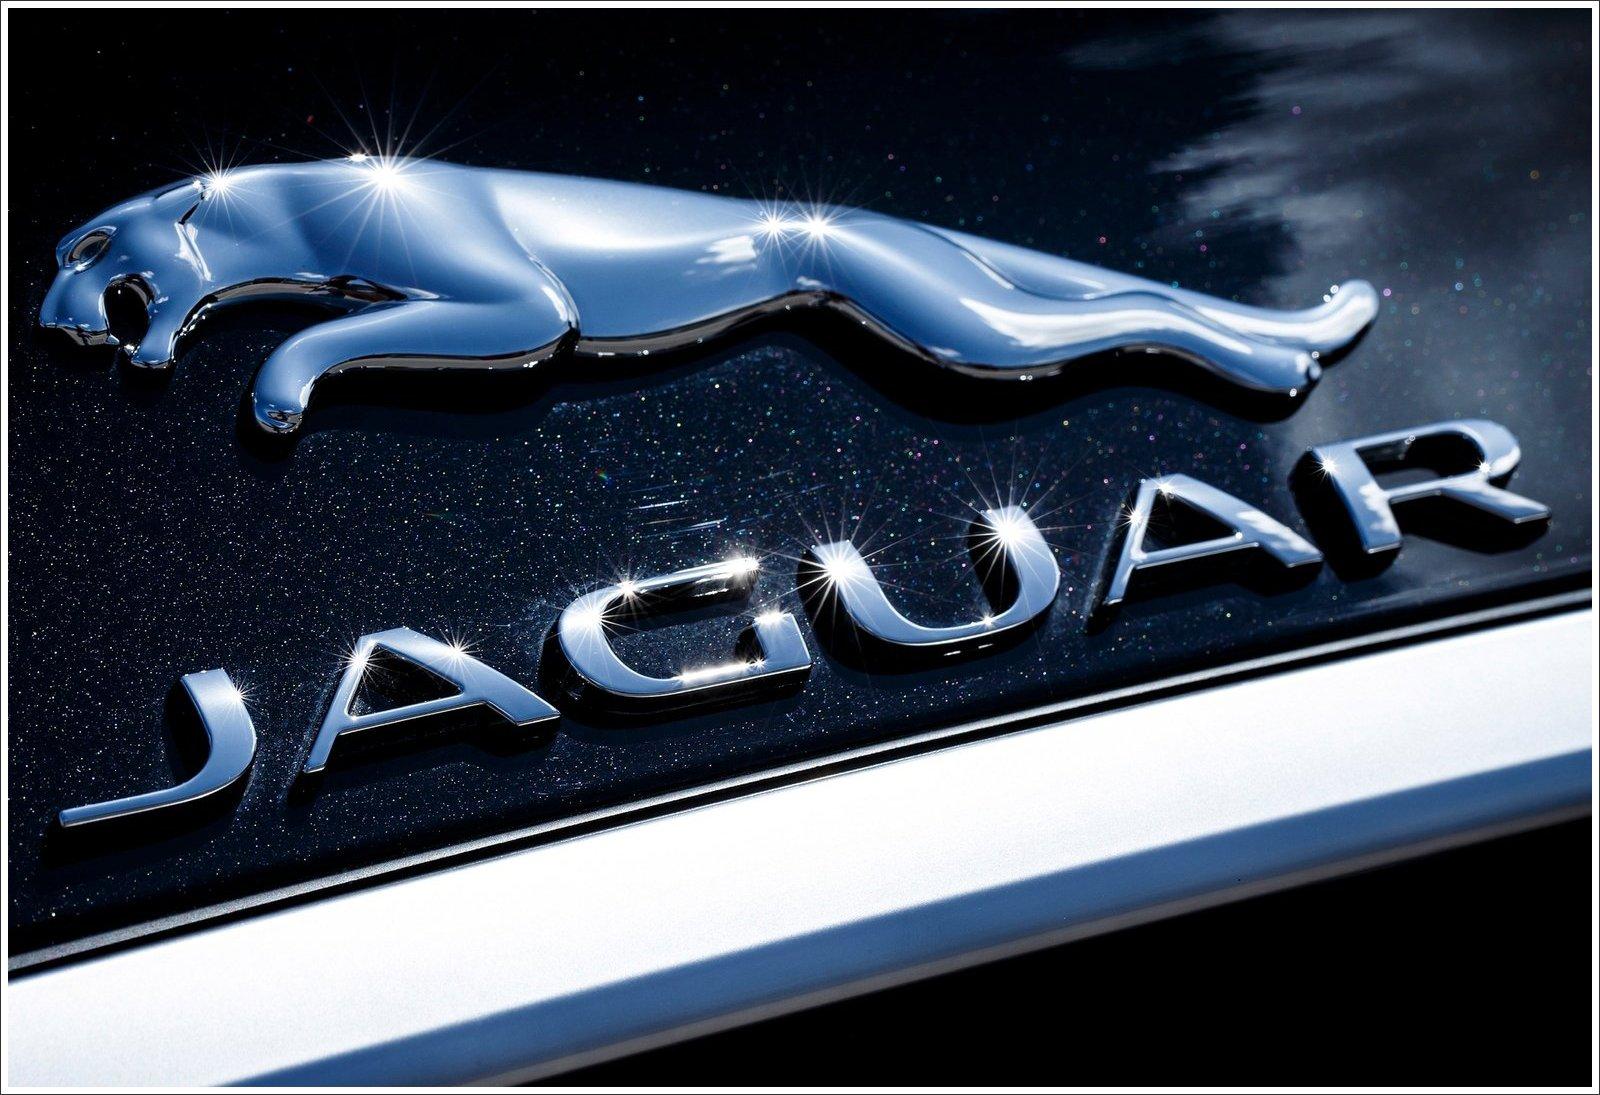 List Of Car Brands >> Jaguar Logo Meaning and History, latest models | World Cars Brands